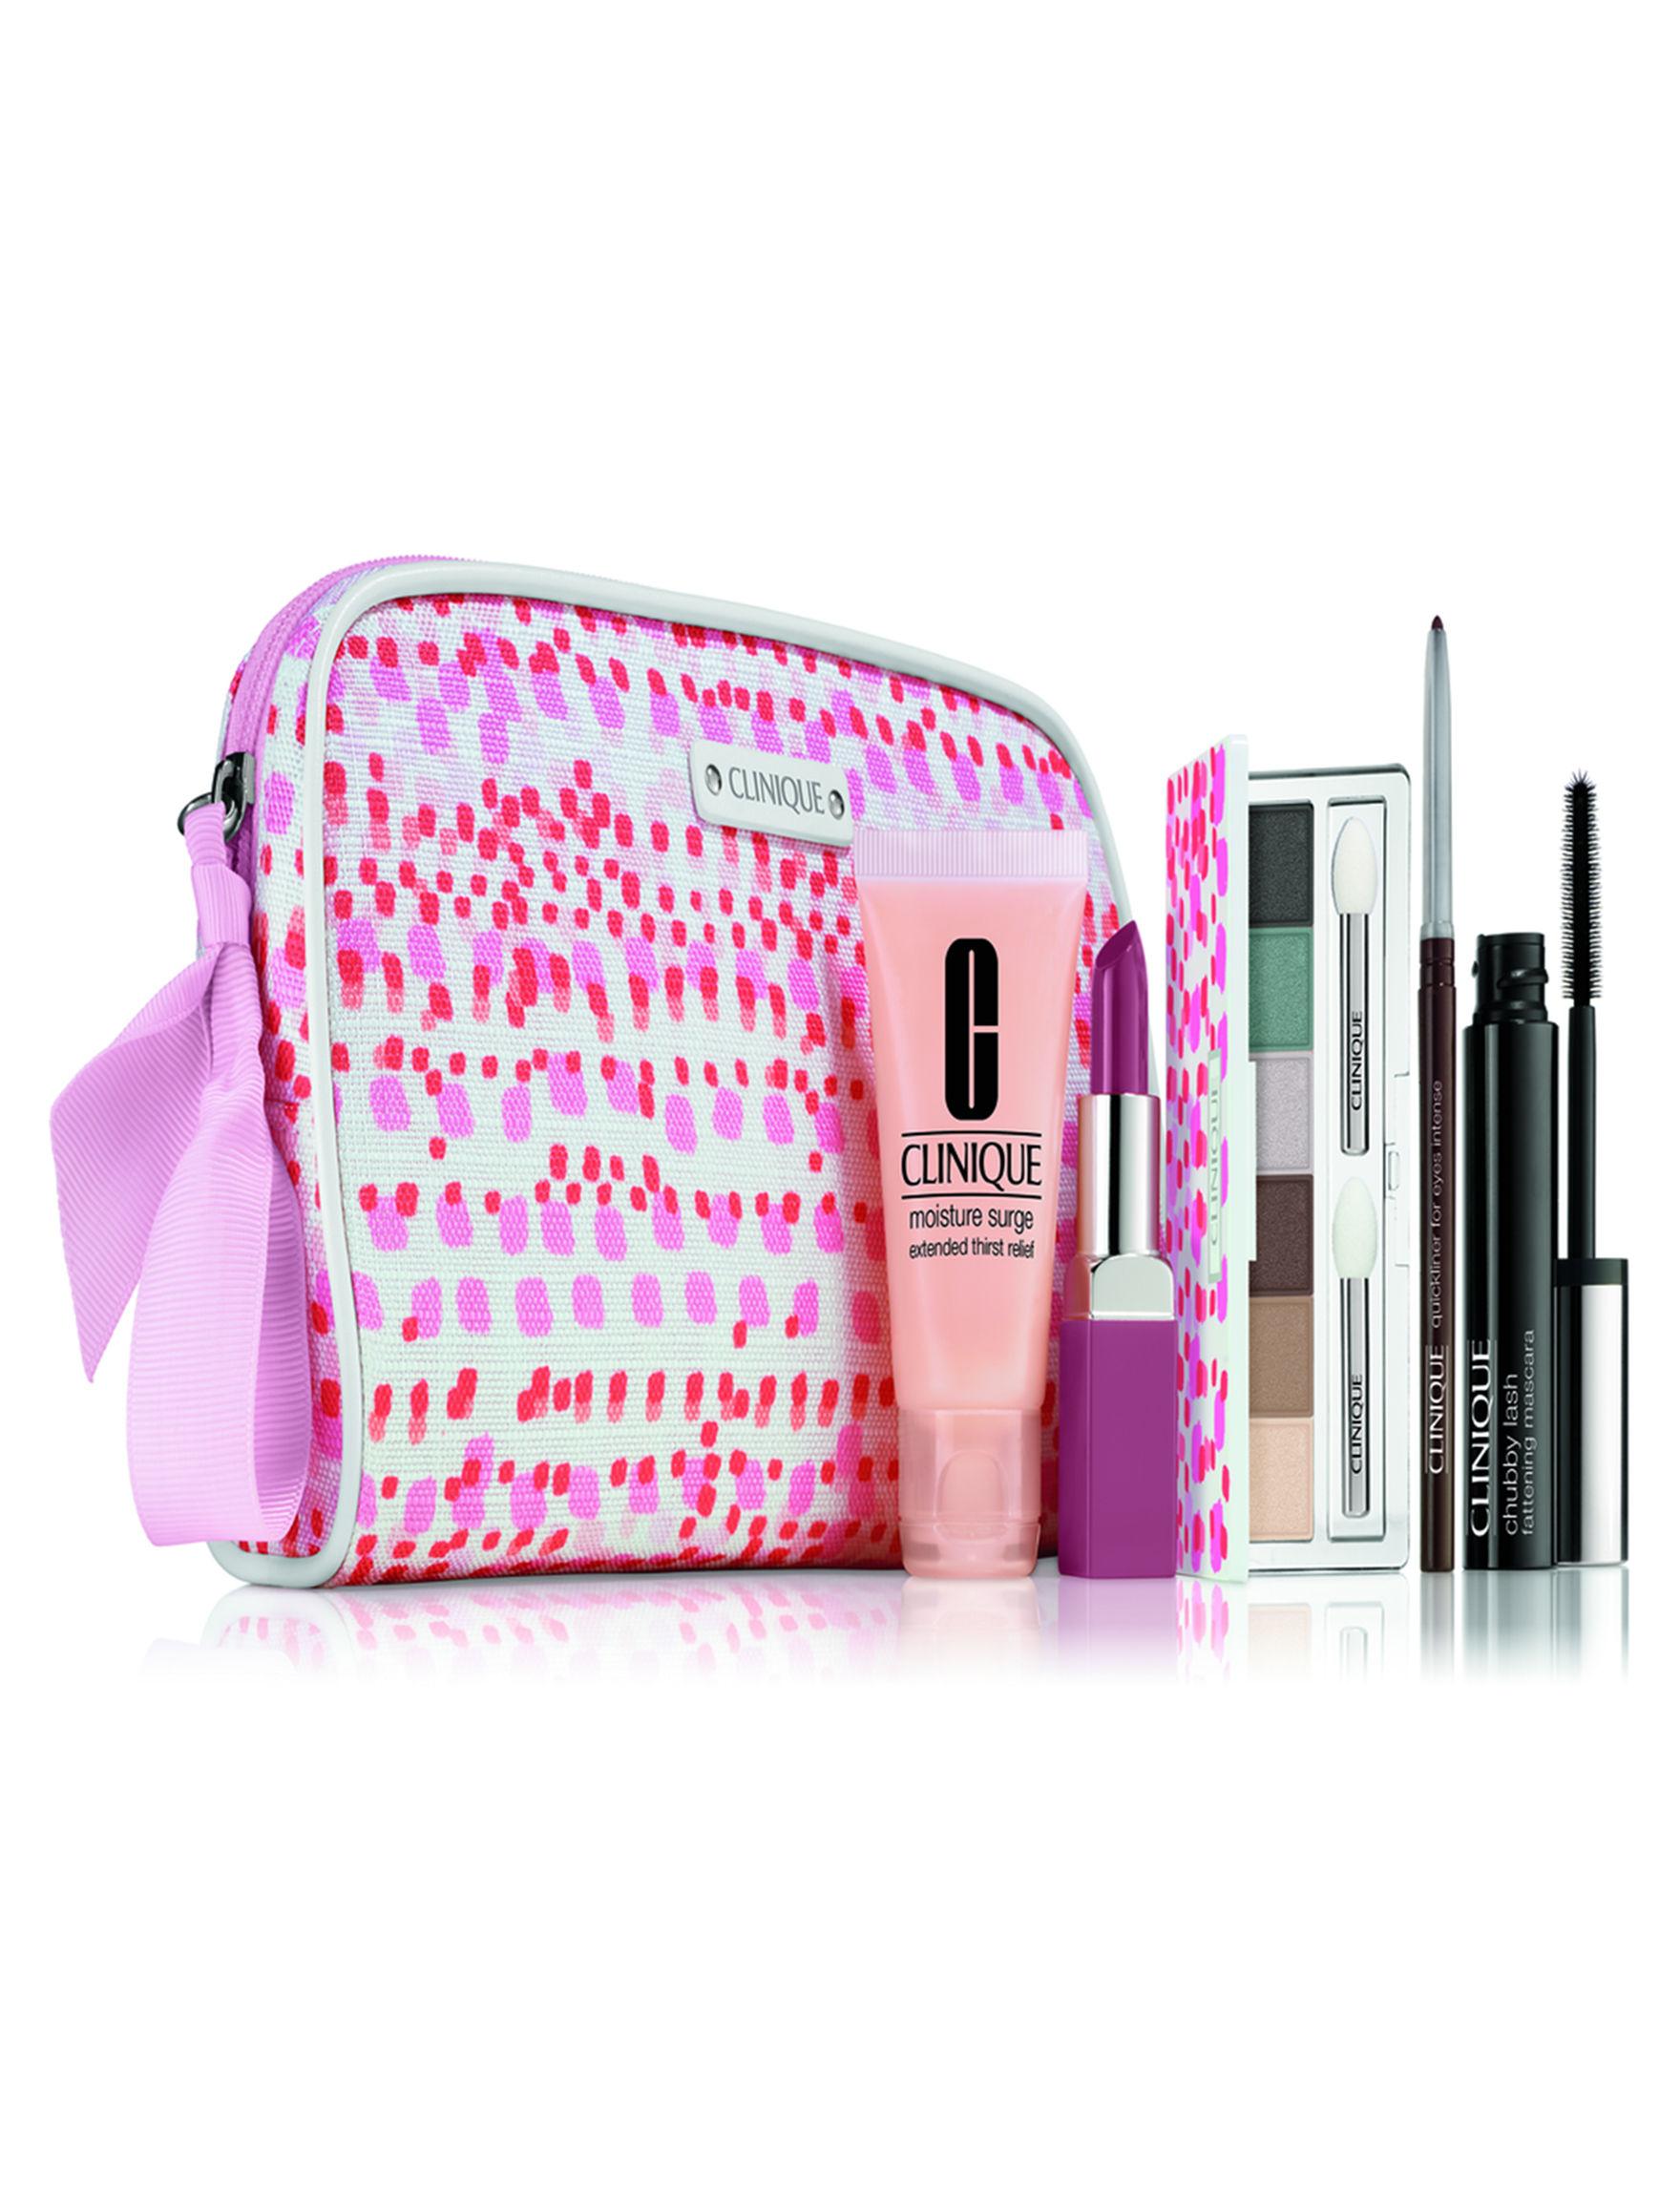 Clinique  Makeup Kits & Sets Eye Liner Eye Shadow Lipstick Mascara